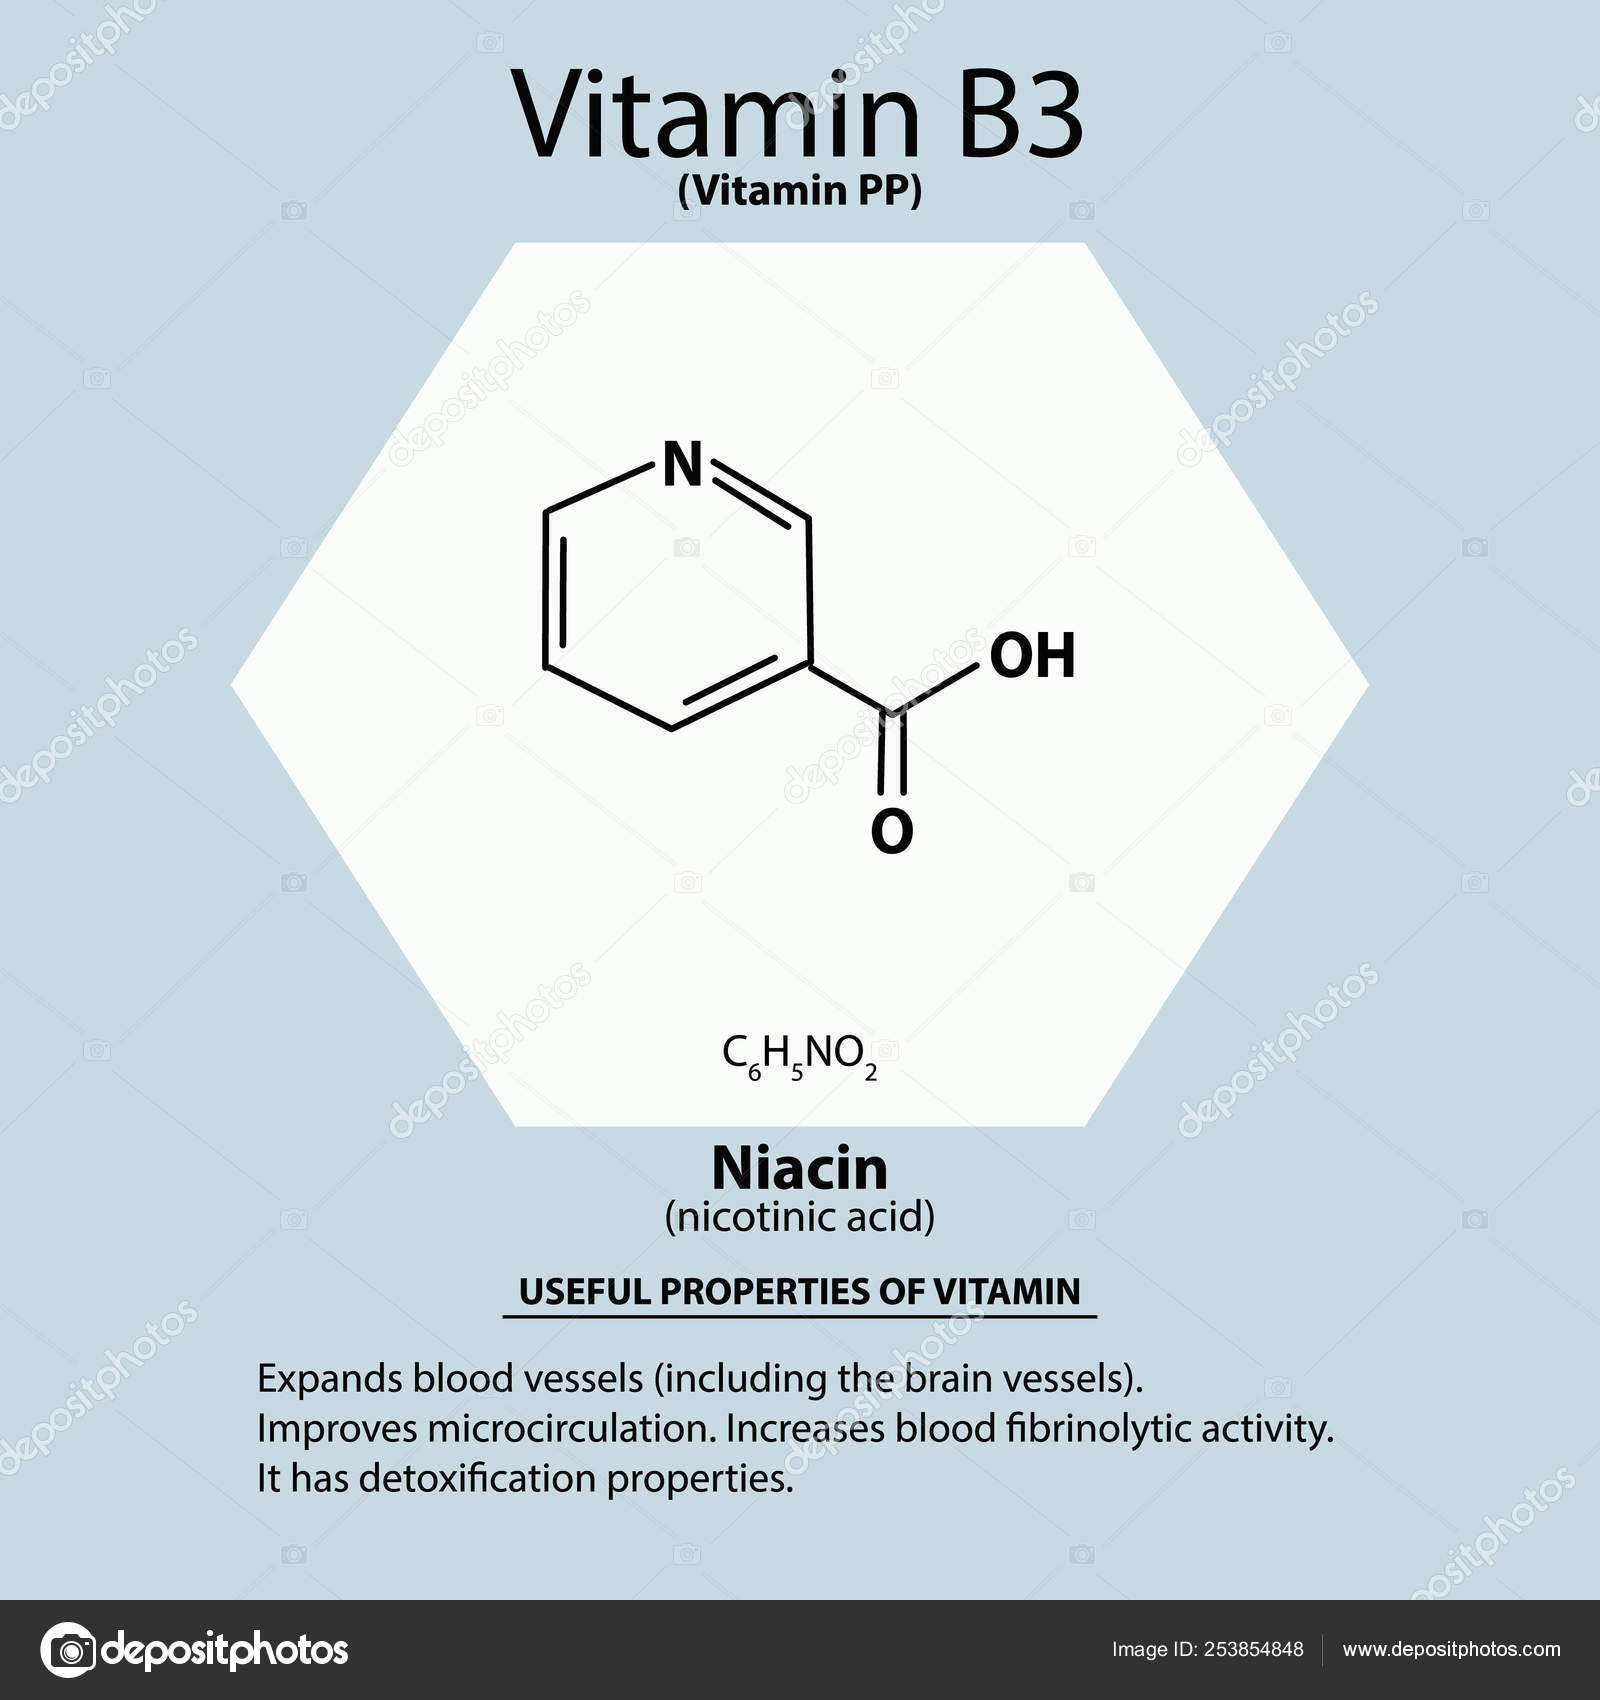 La Vitamina B3 Un ácido Nicotínico Niacina Vitamina Pp